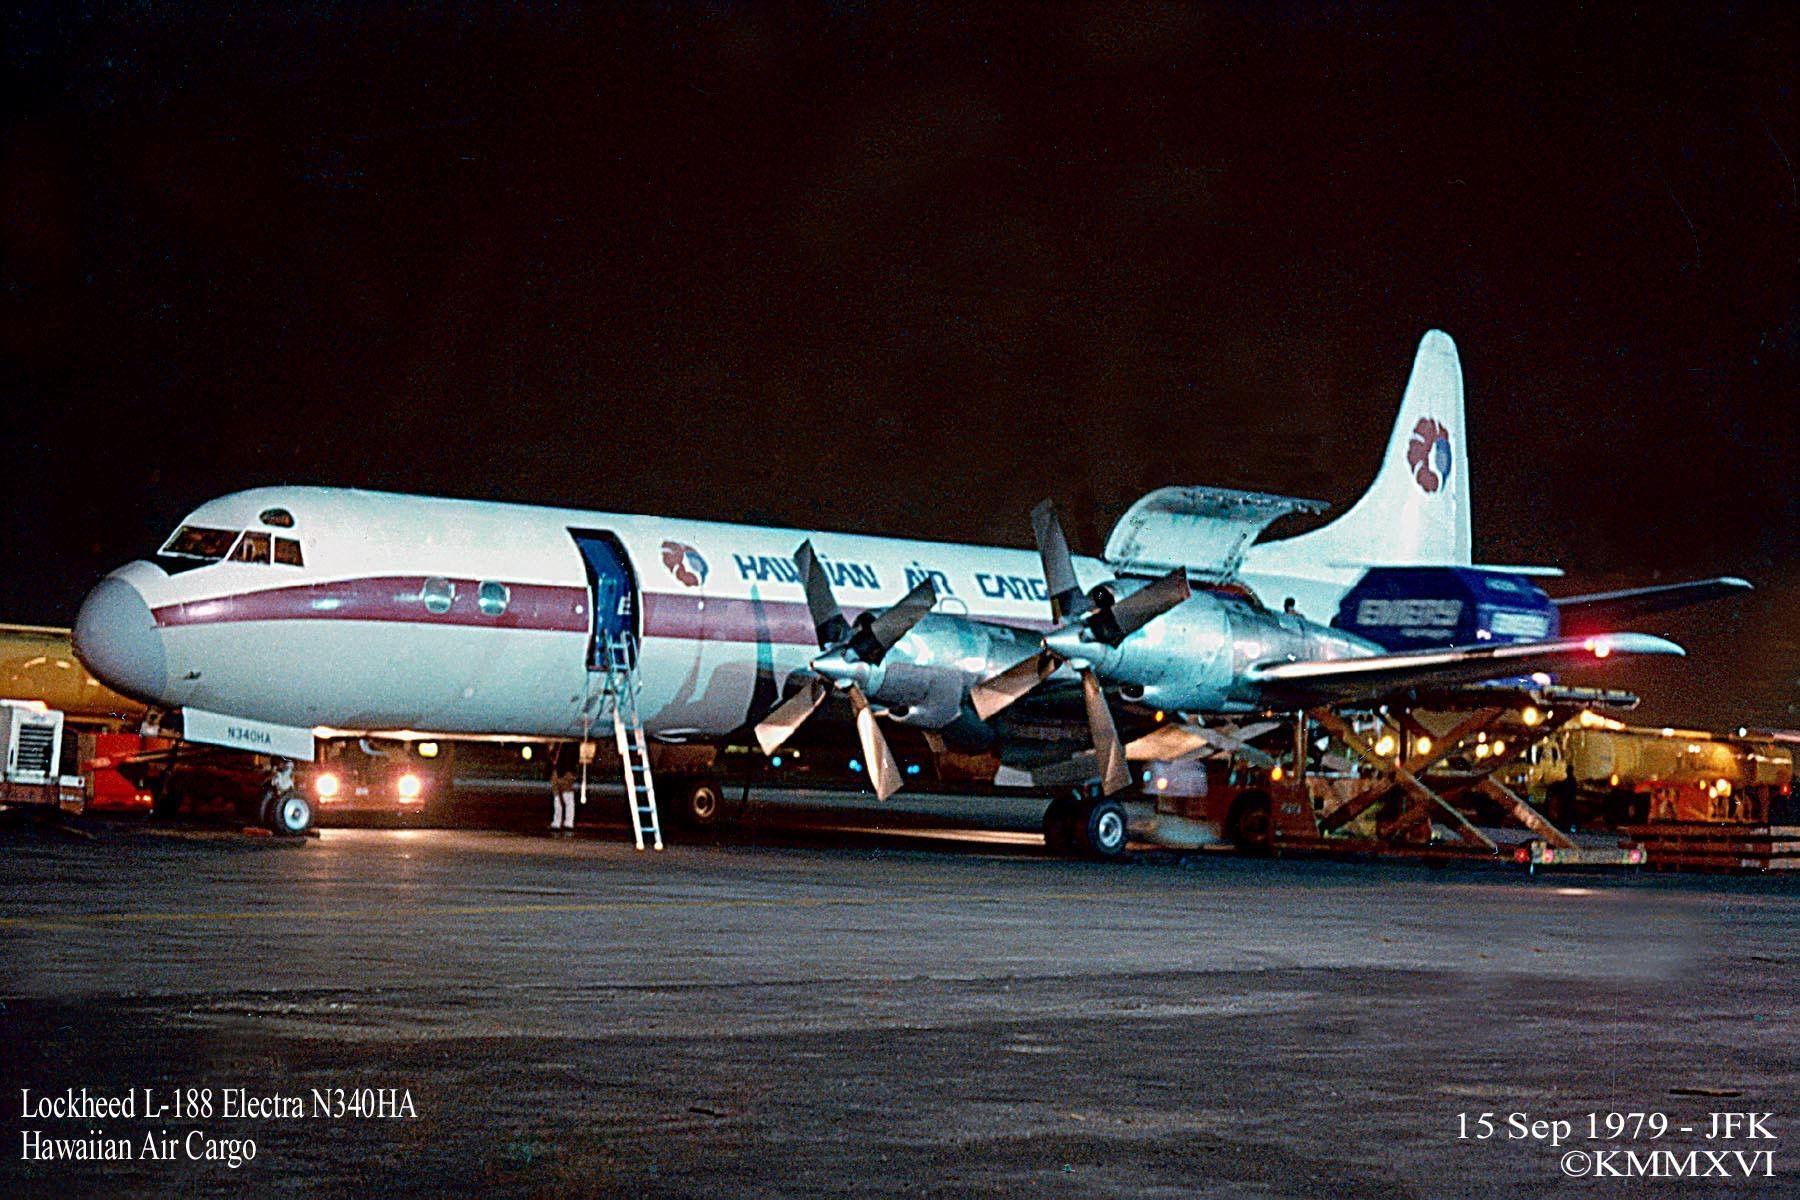 Pin by Edmund Rivera on AirFreight Classics Lockheed